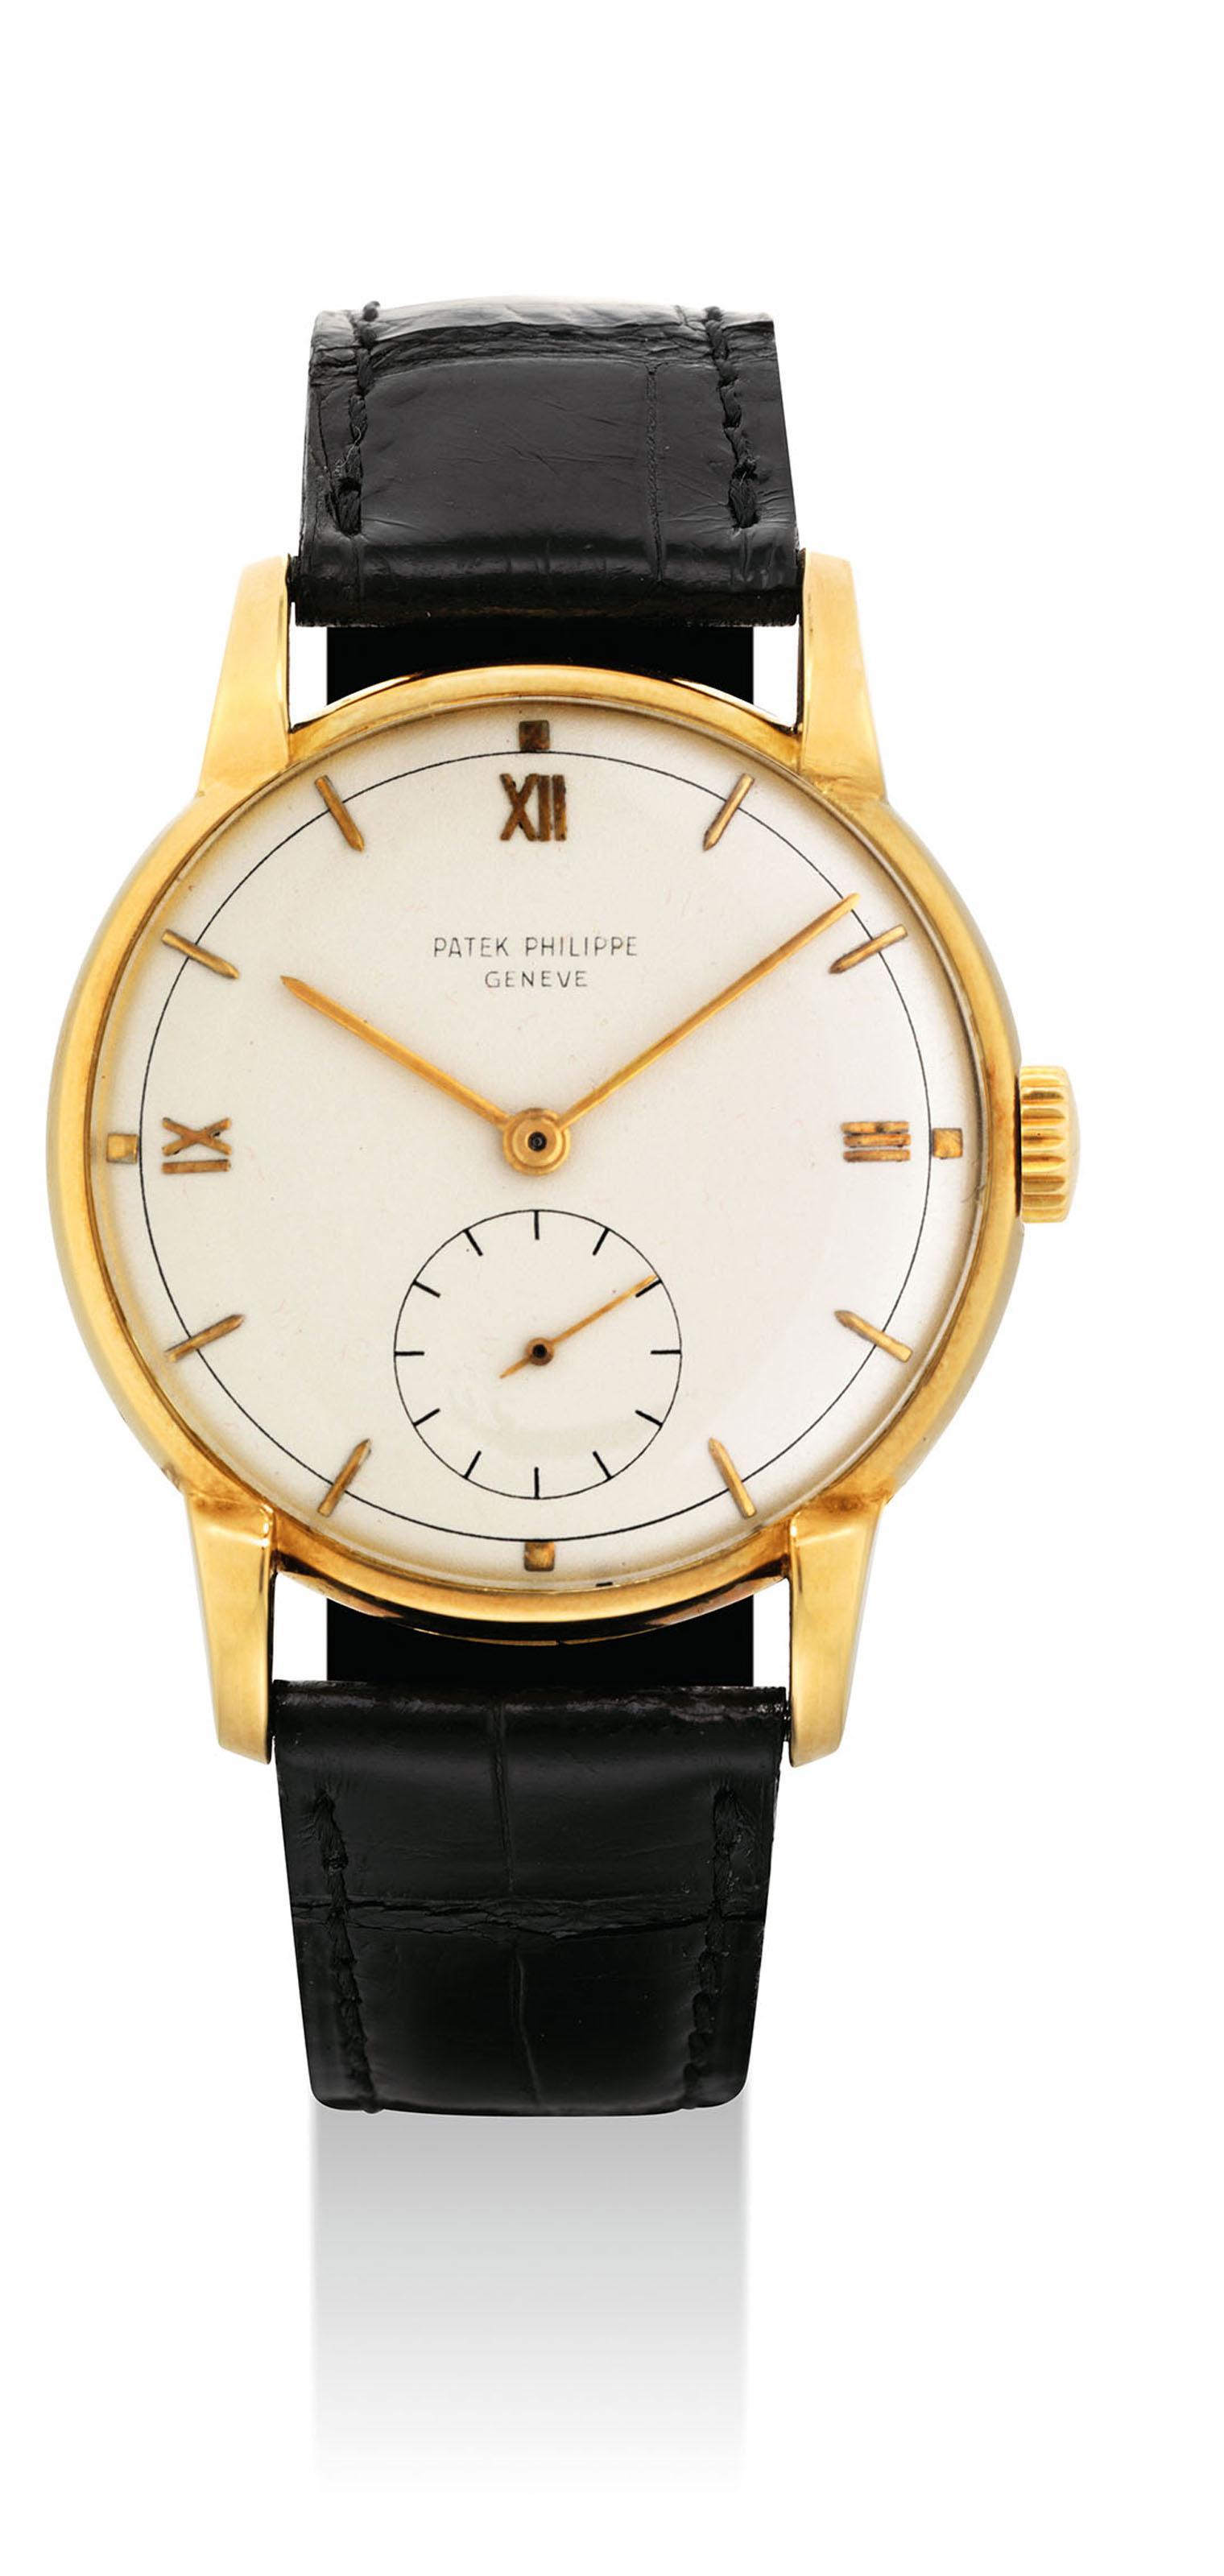 Patek philippe a rare 18k gold wristwatch signed patek philippe geneve ref 2430 movement for Patek philippe geneve